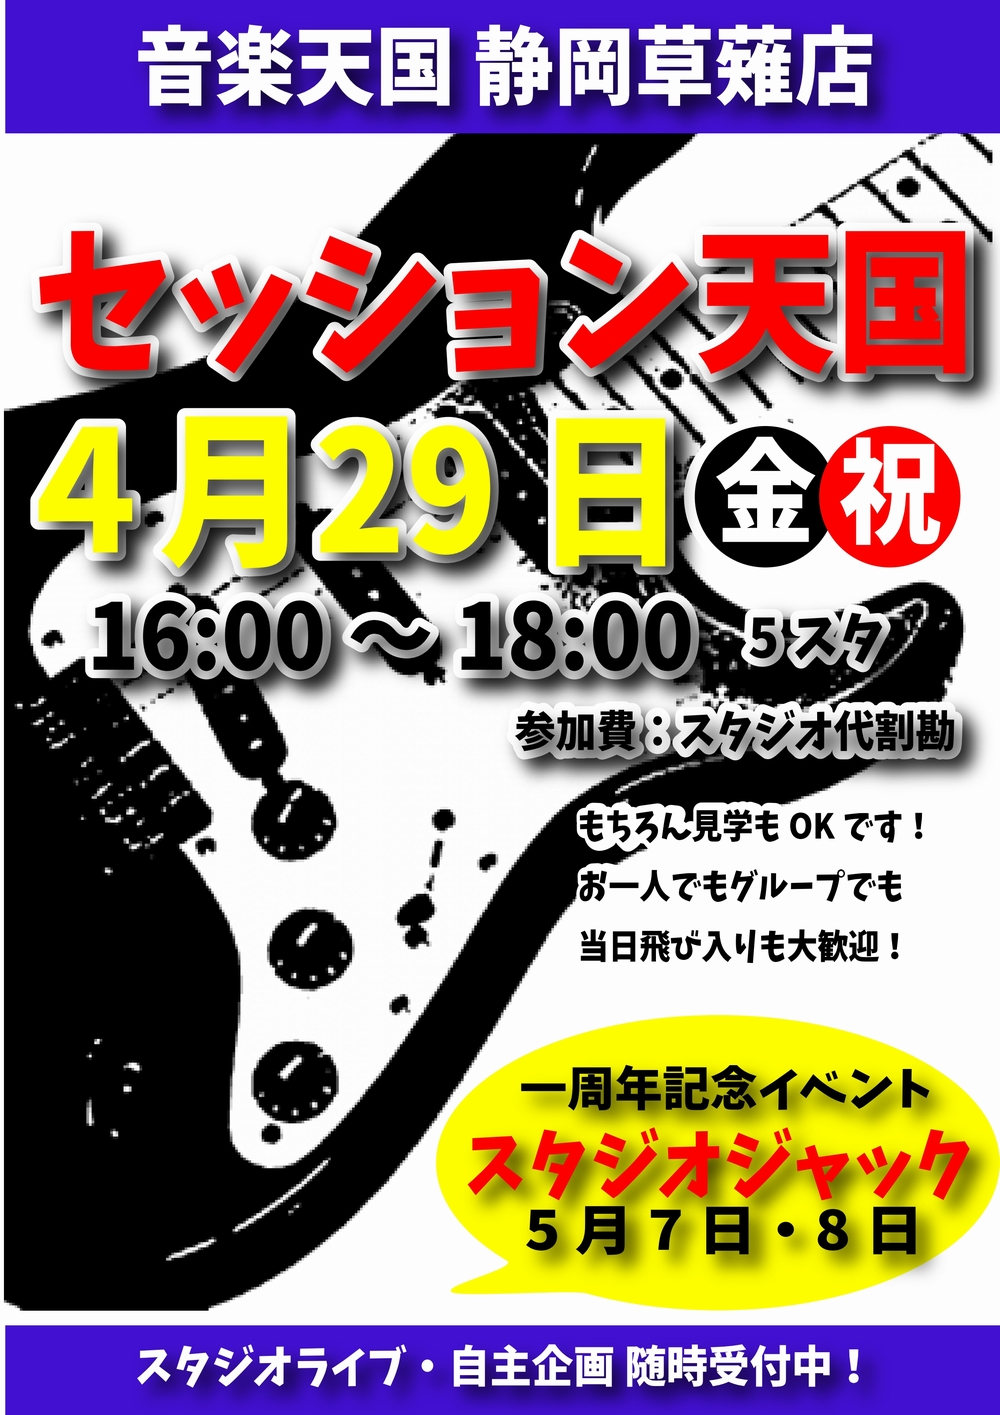 【セッション天国】音楽天国・静岡草薙店4月29日(祝)開催